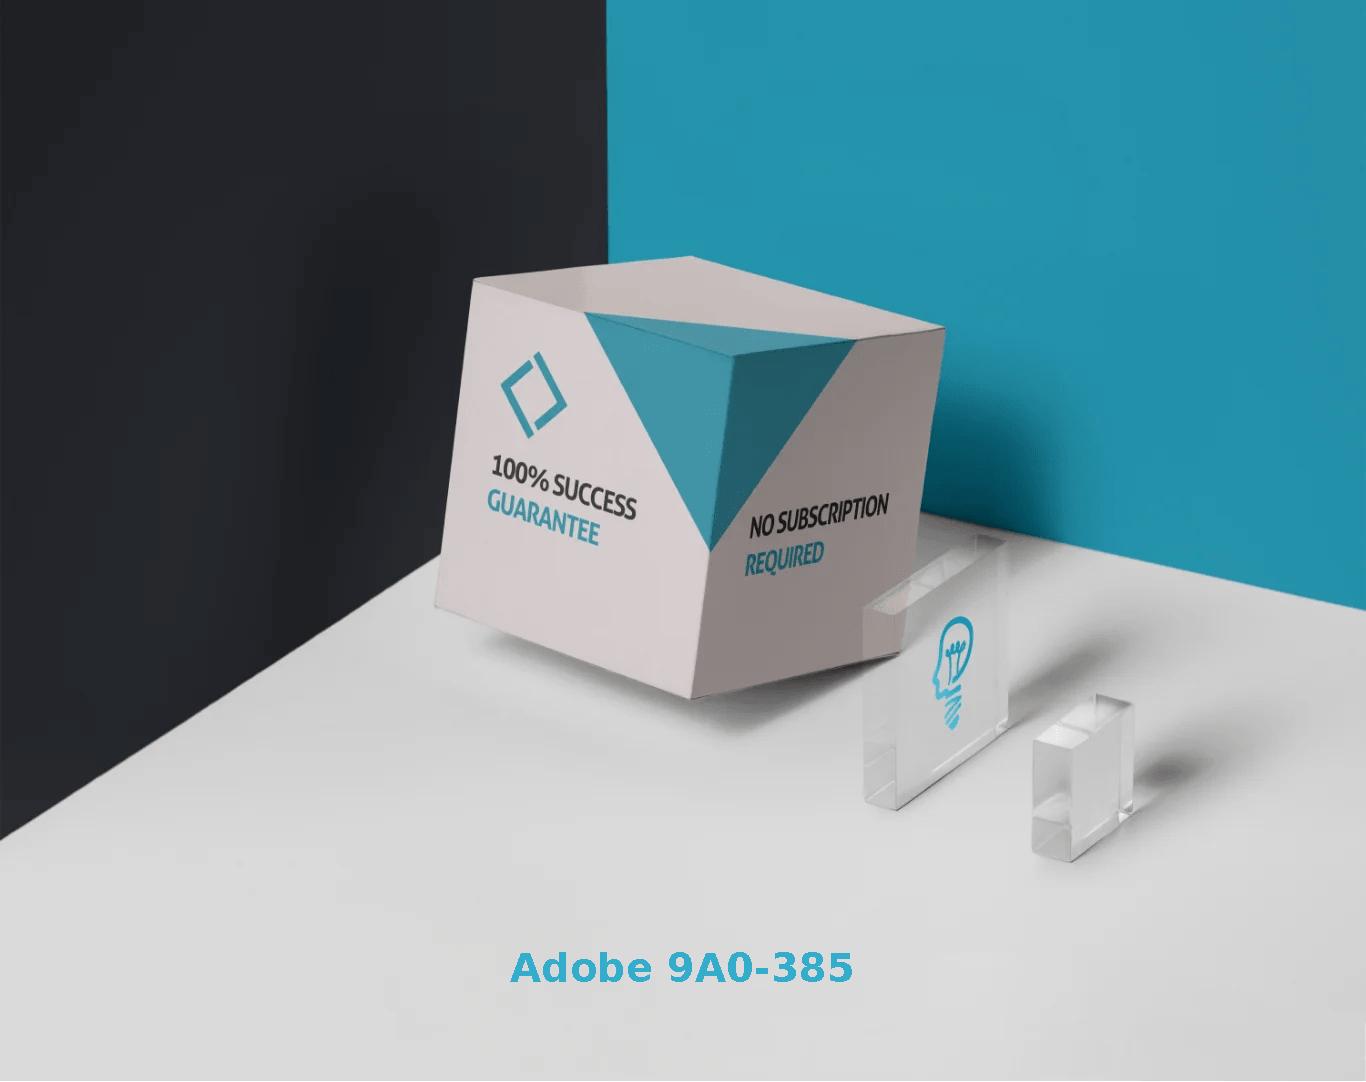 Adobe Experience Manager 6.0 Architect Exam Test 9A0-385 Exam QA PDF+Simulator